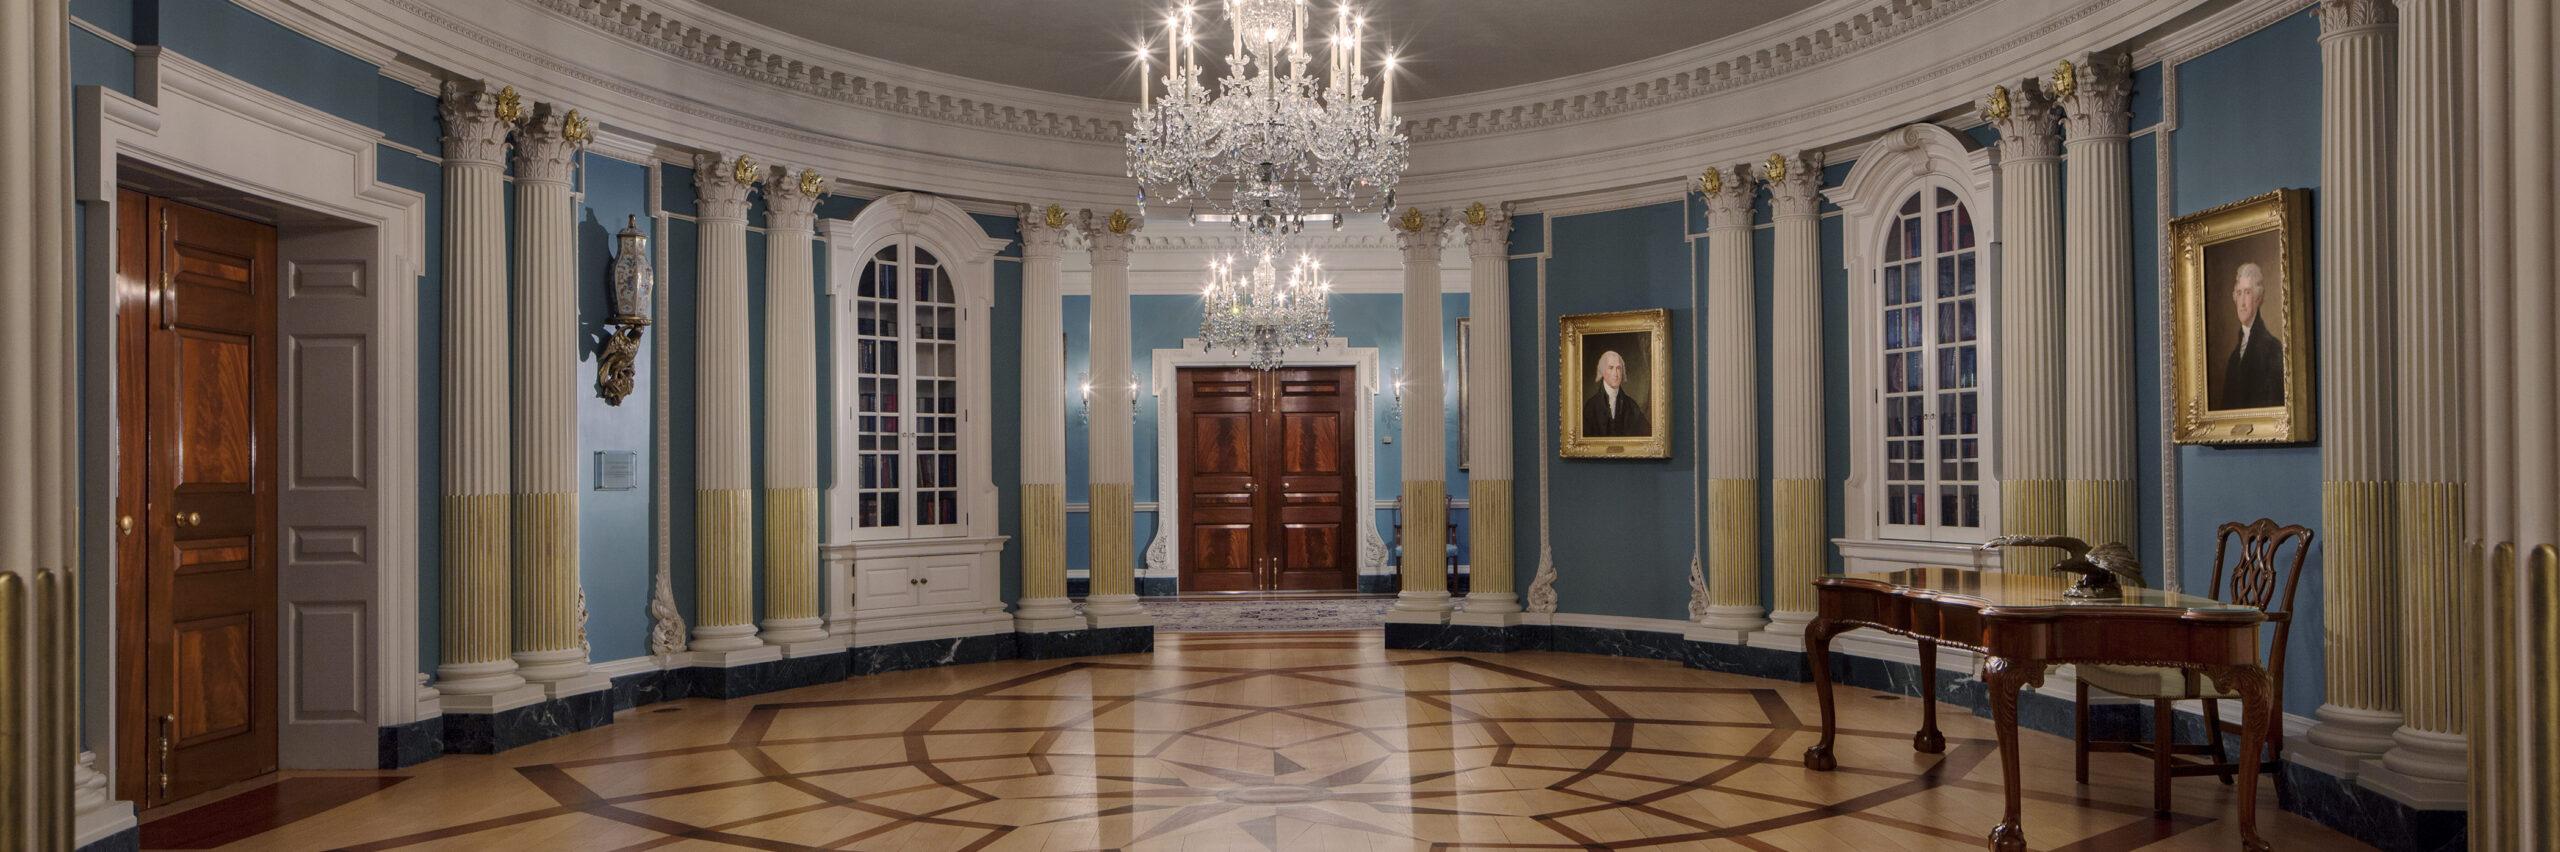 The Treaty Room [State Department Image - Chris Stump]